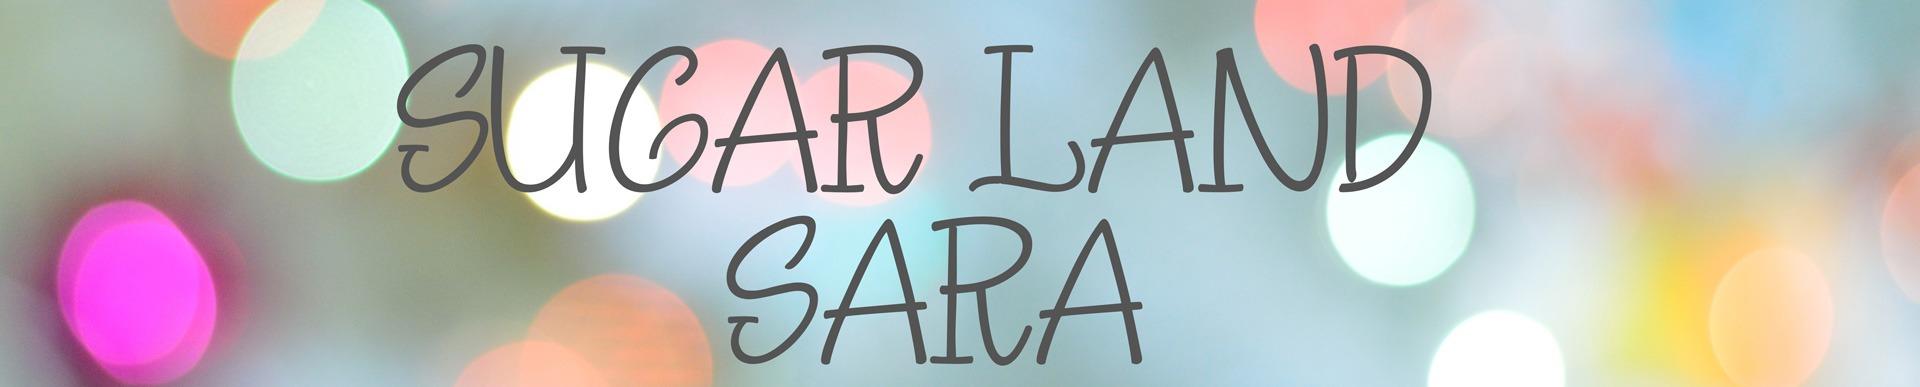 Sugar Land Sara